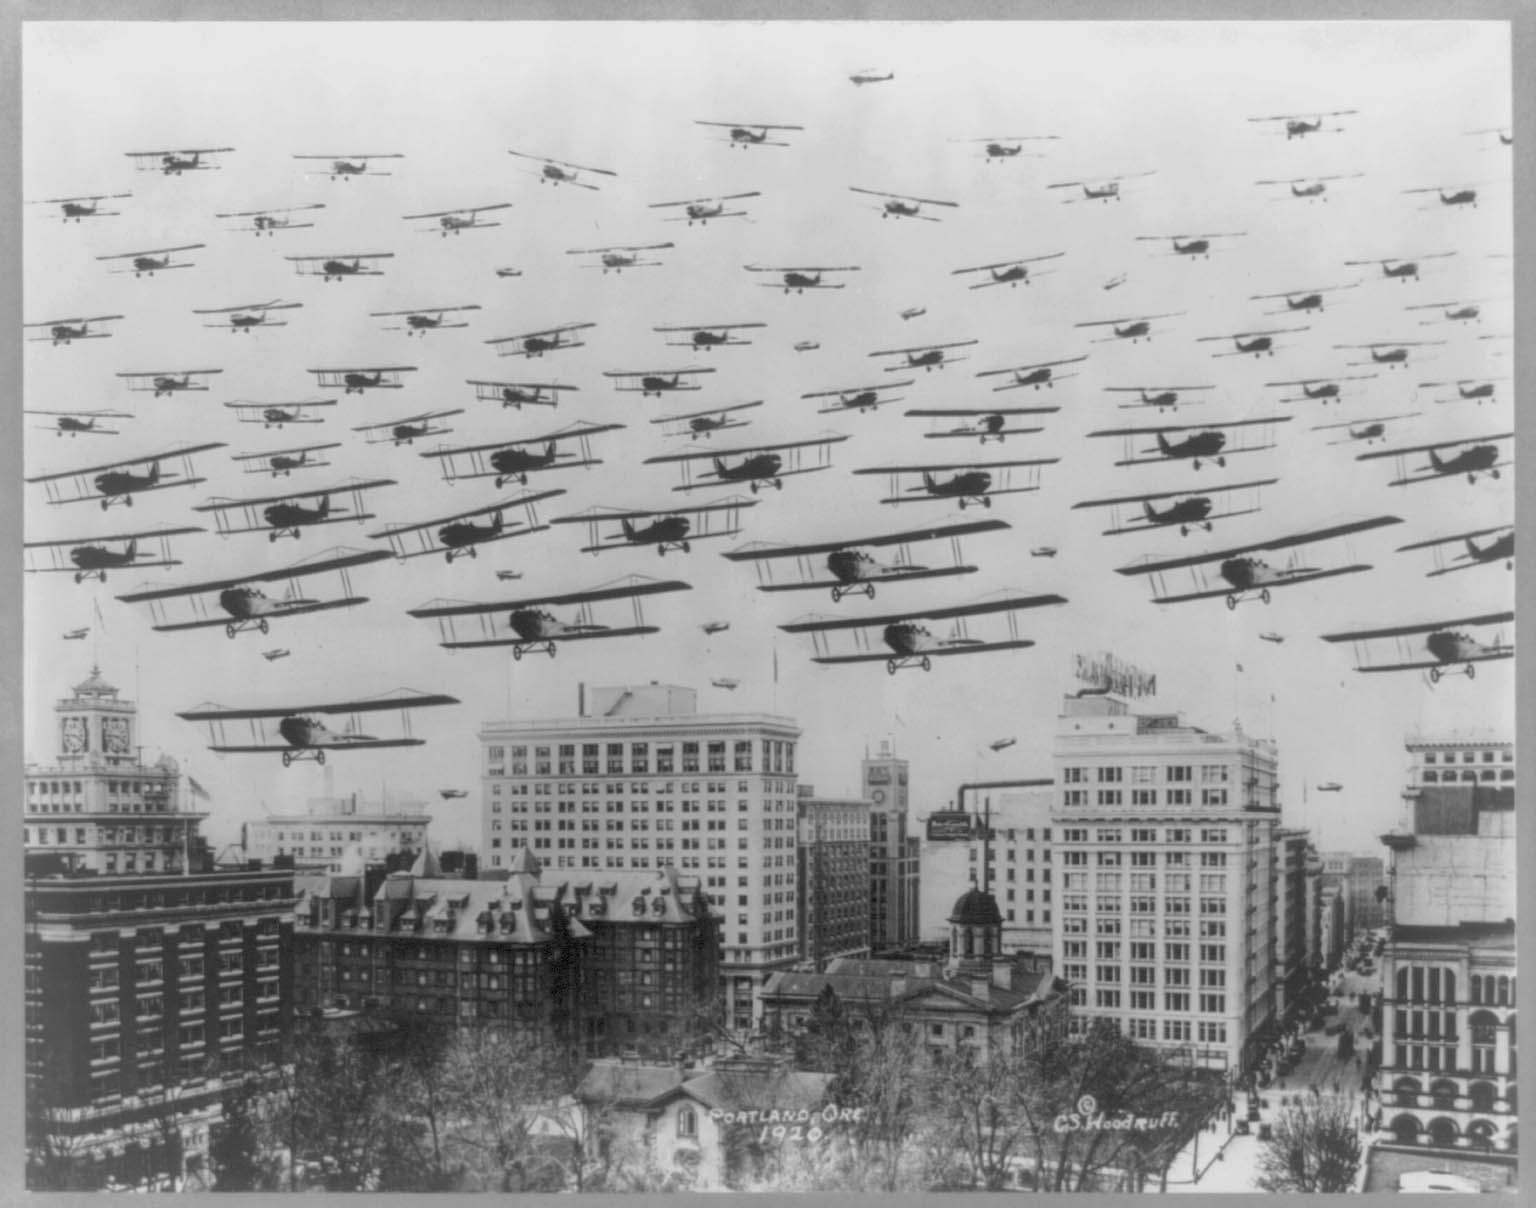 Biplanes Over Portland 1920